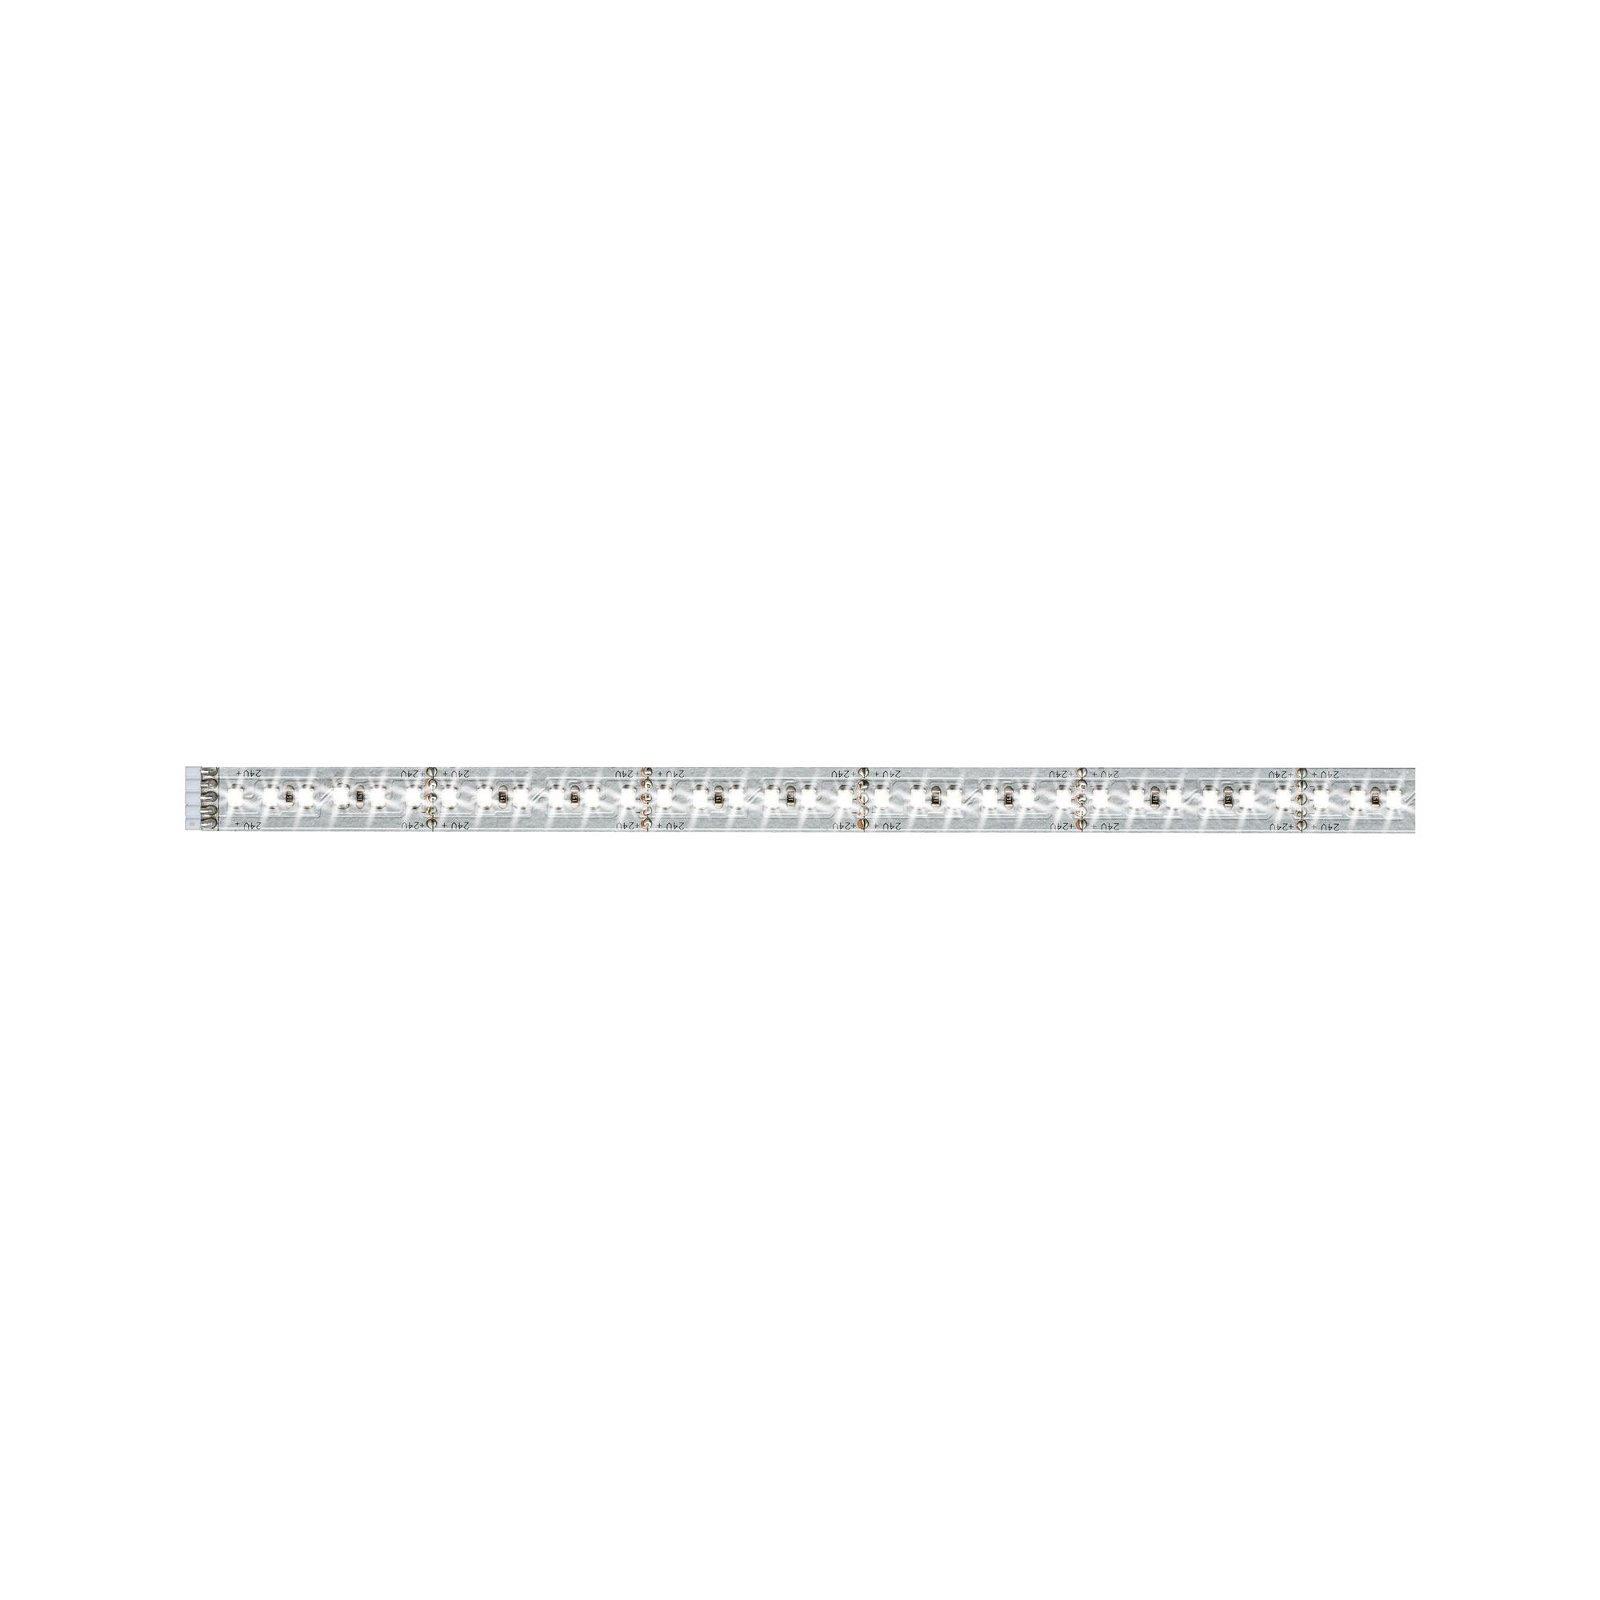 MaxLED 1000 LED Strip Daglichtwit 1m 11,5W 1100lm/m 6500K